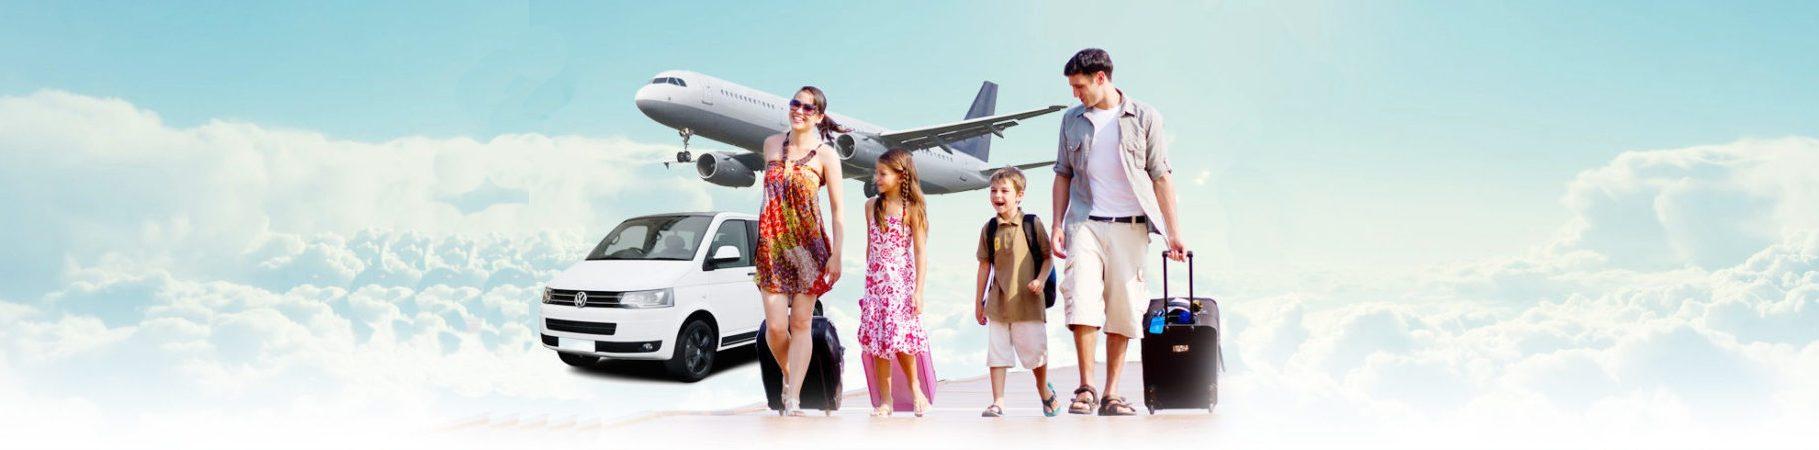 Malaga Airport Transfer